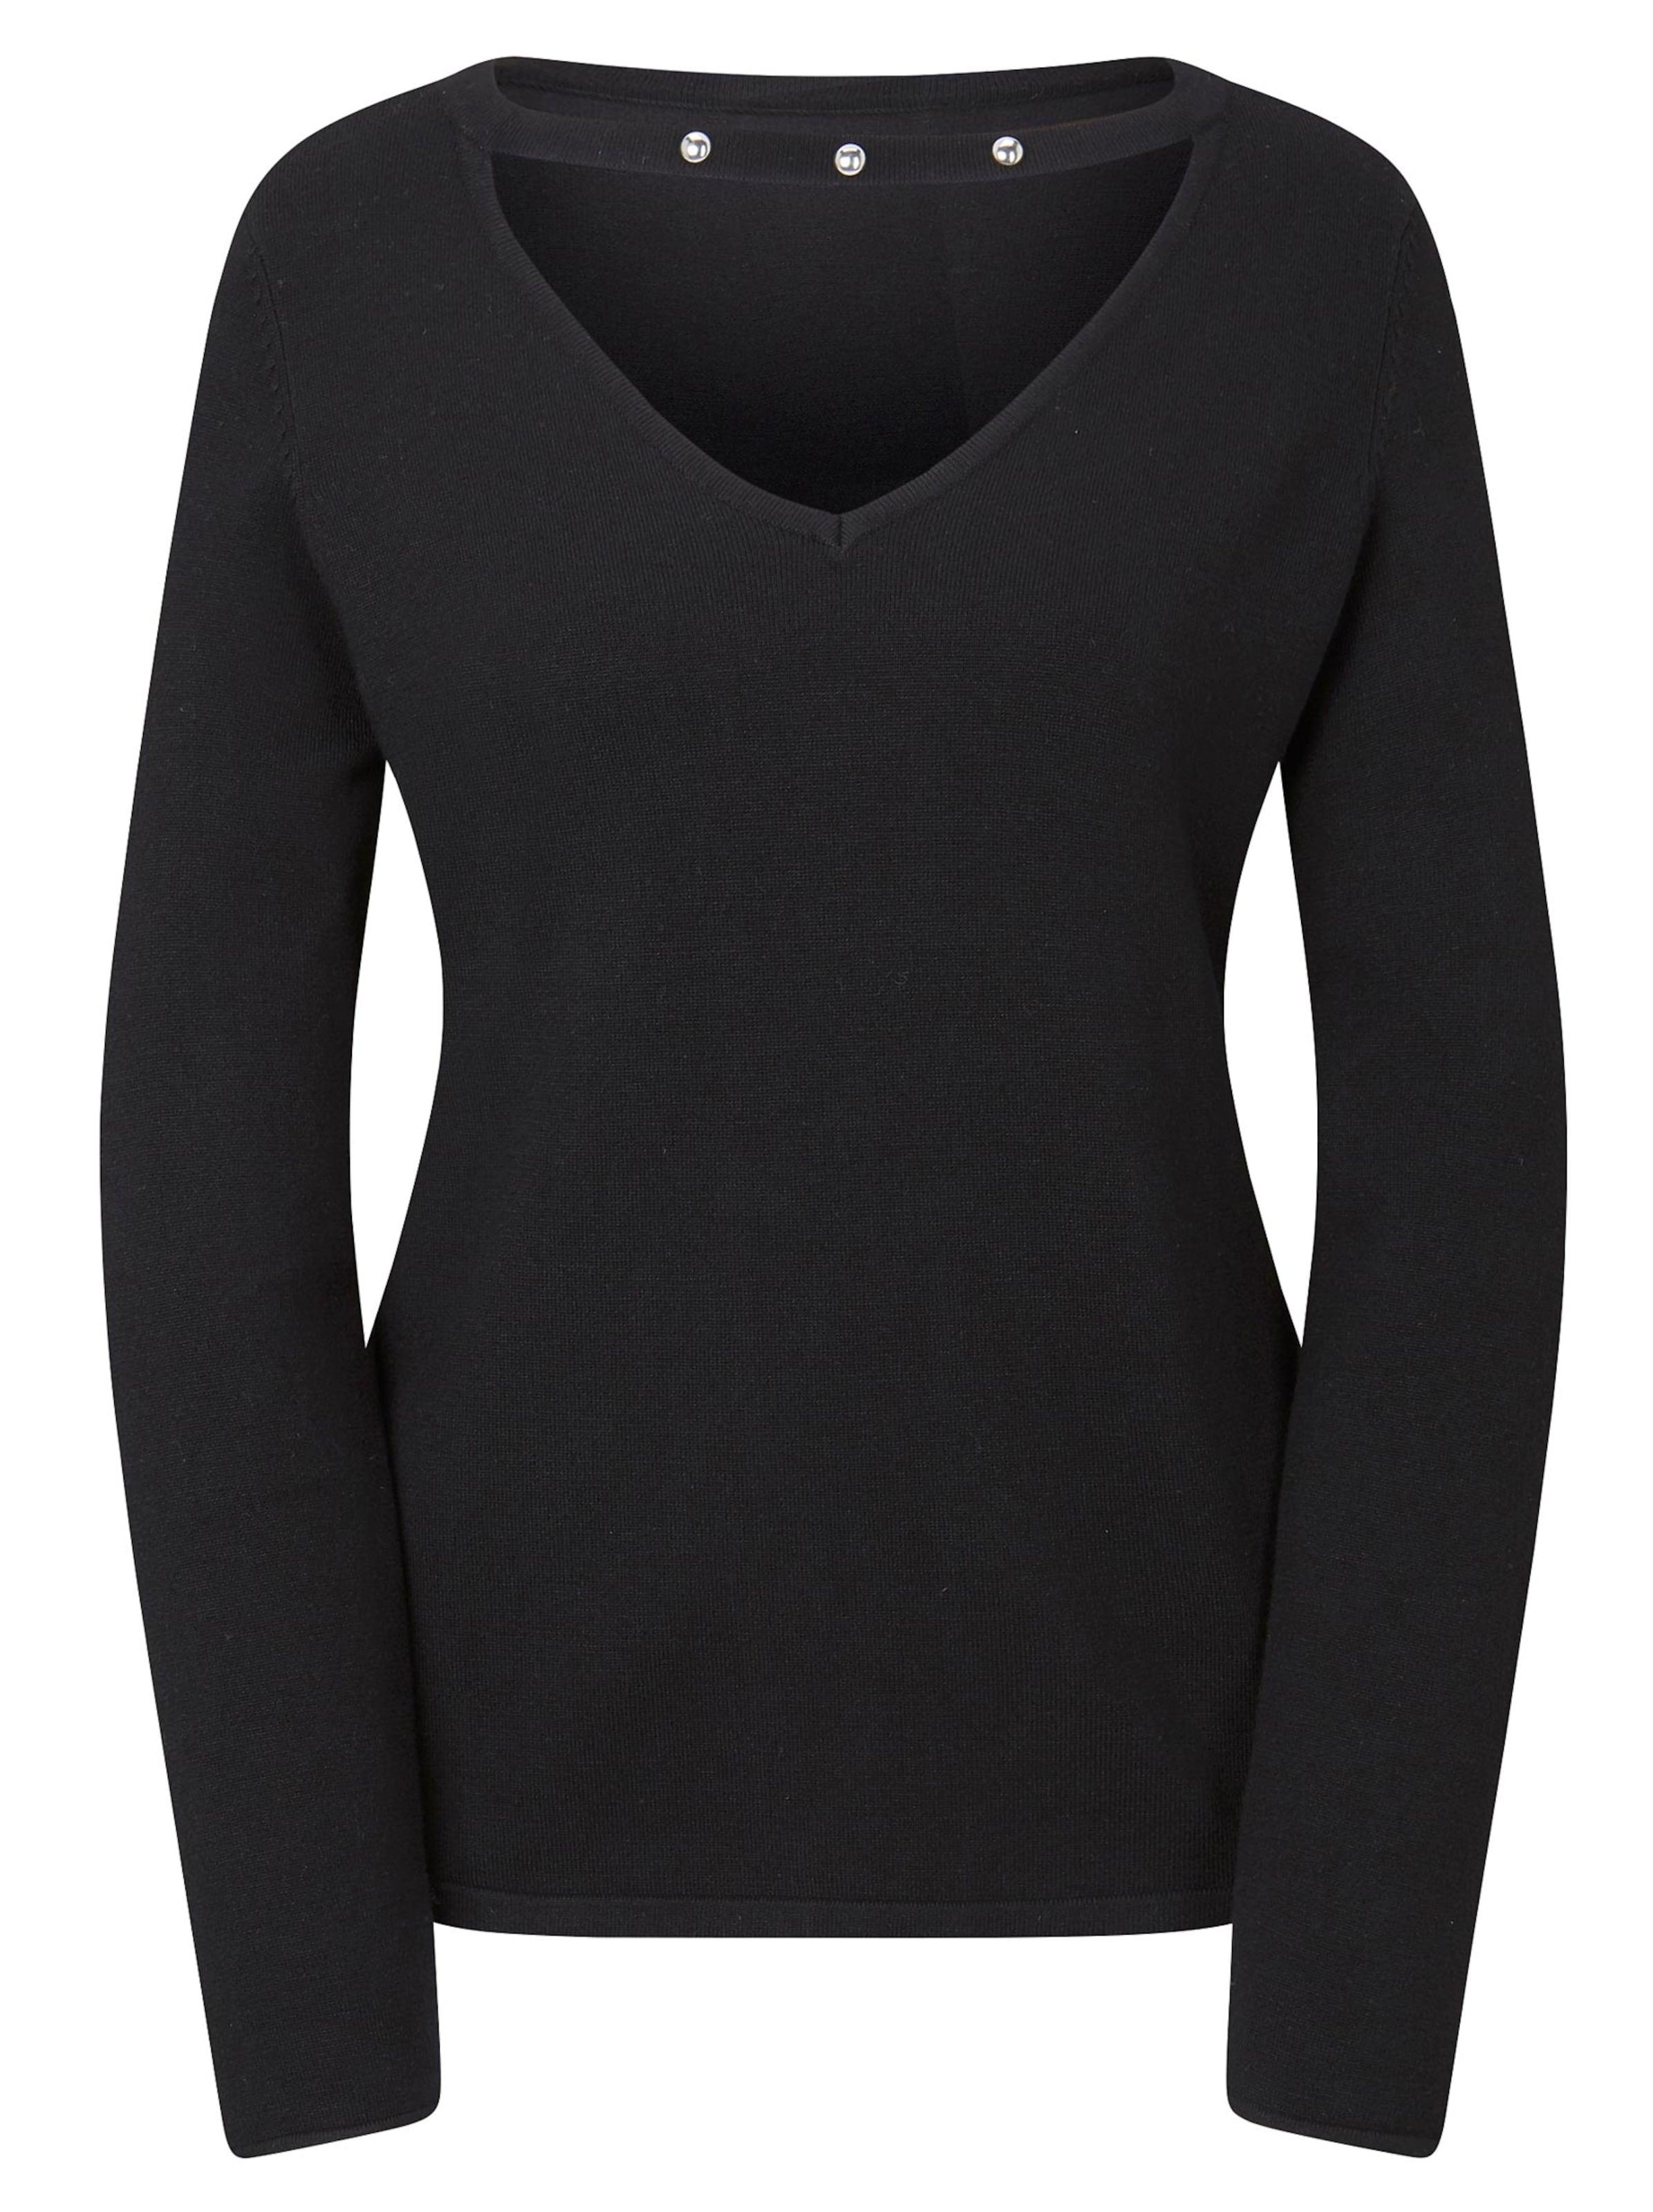 witt weiden -  Damen Pullover schwarz